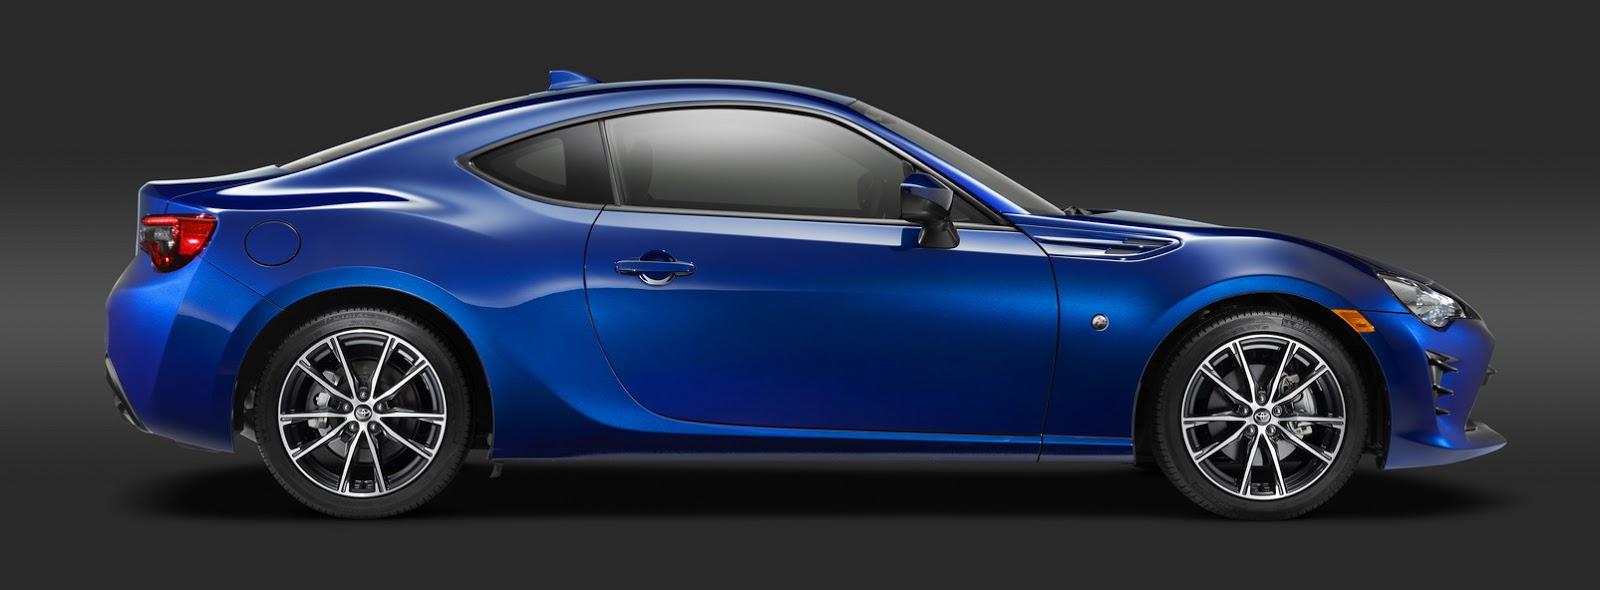 Categories Geneva Motor Show New Cars Scion FR-S Toyota Toyota 86